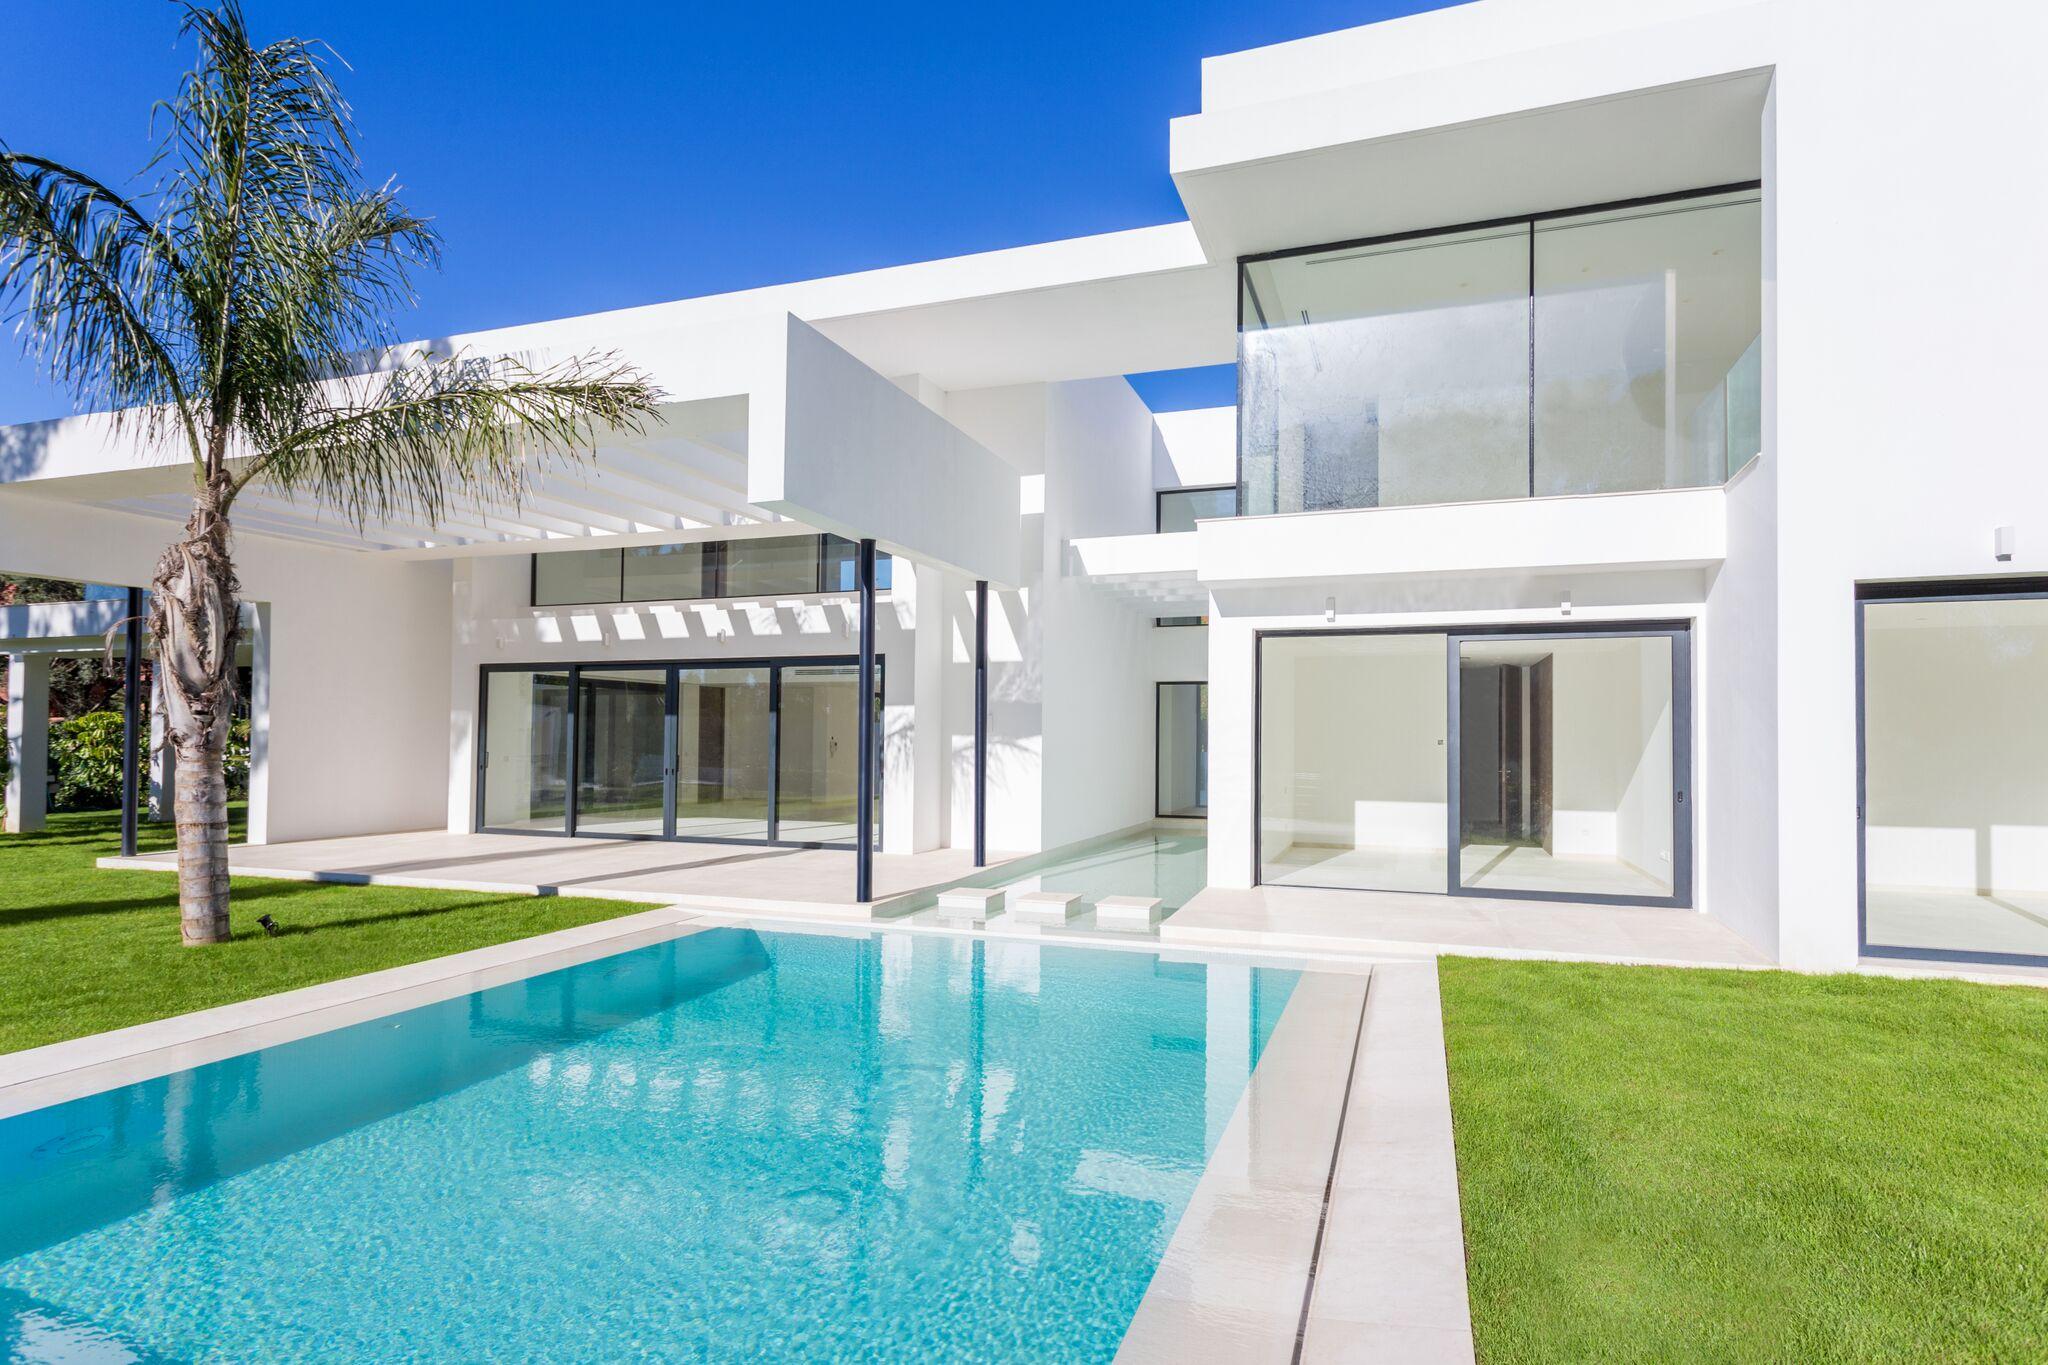 Casasola Contemporary Villa Reduced From 2.950.000€ to 2.700.000€